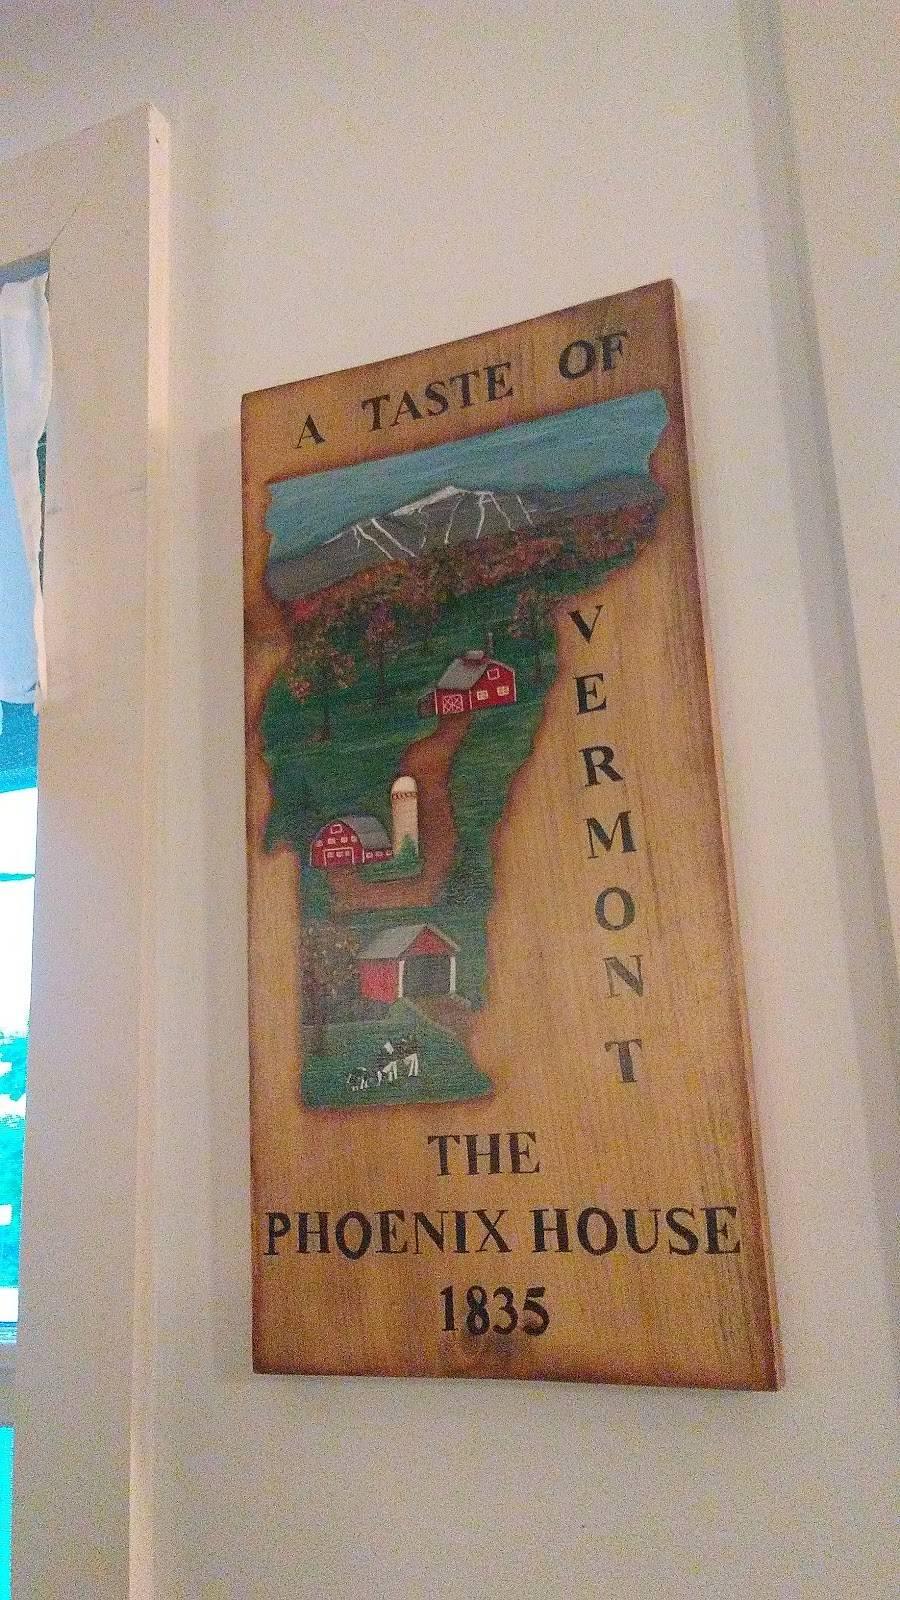 Phoenix House Restaurant & Bakery   restaurant   7 Potato Hill Rd, Enosburg Falls, VT 05450, USA   8029338400 OR +1 802-933-8400